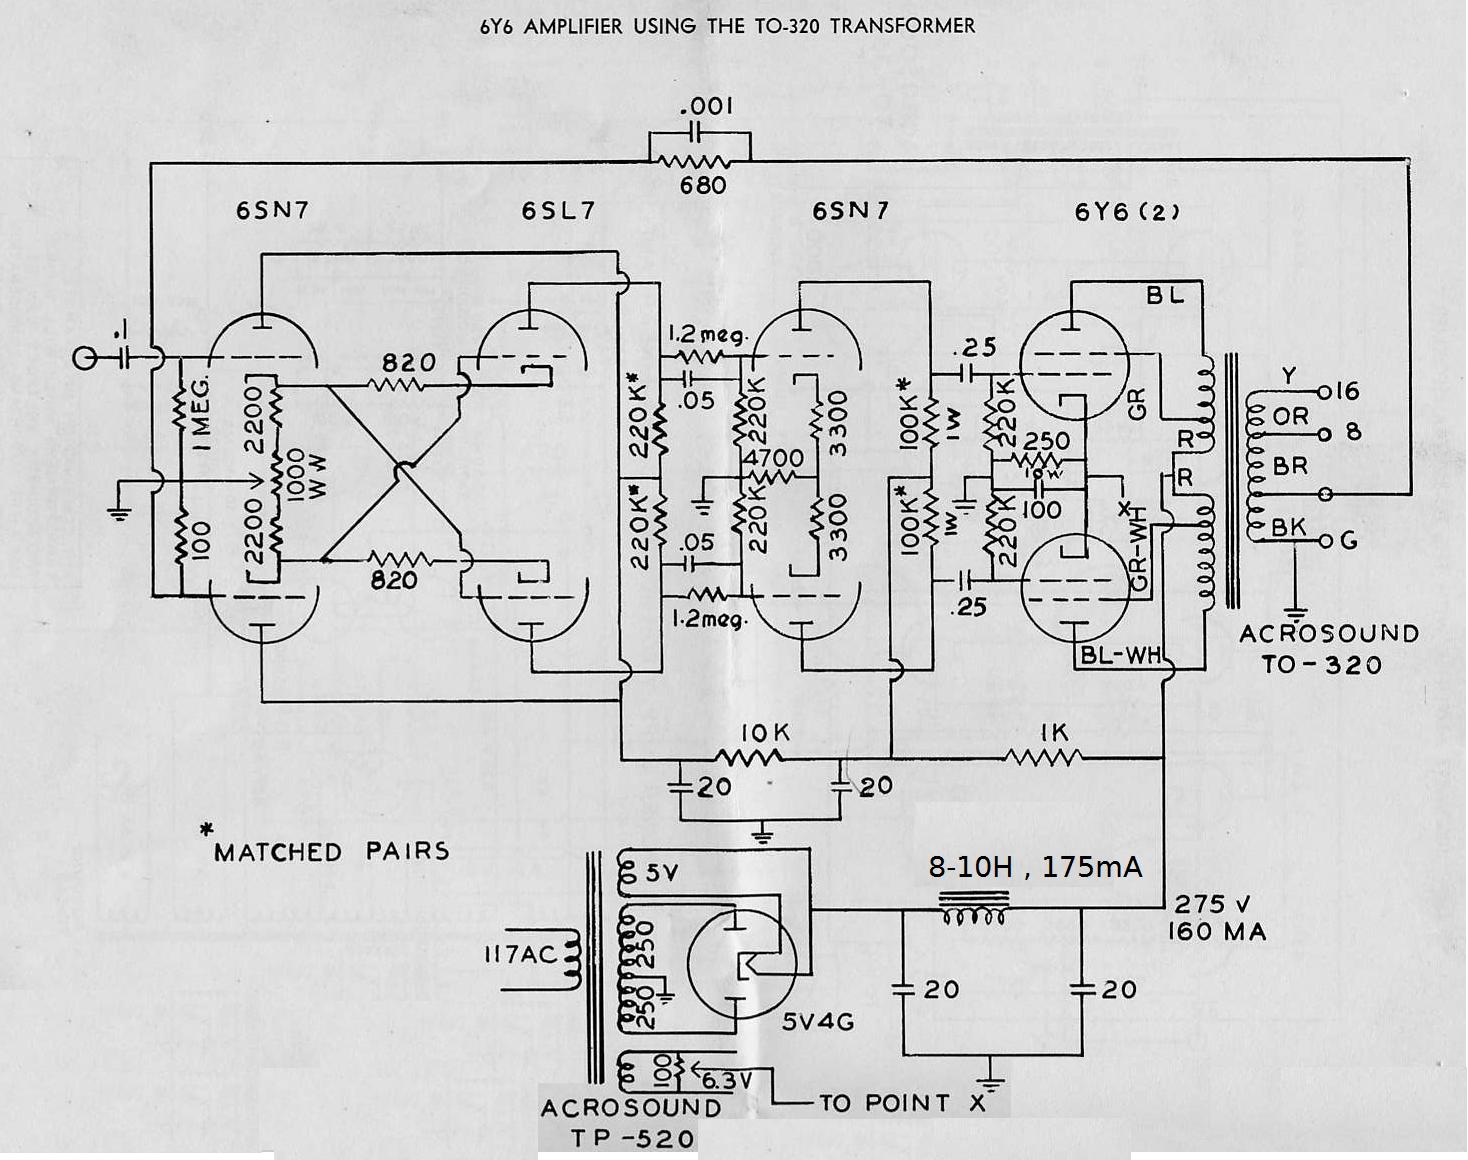 Acrosound , CCPS 6Y6G